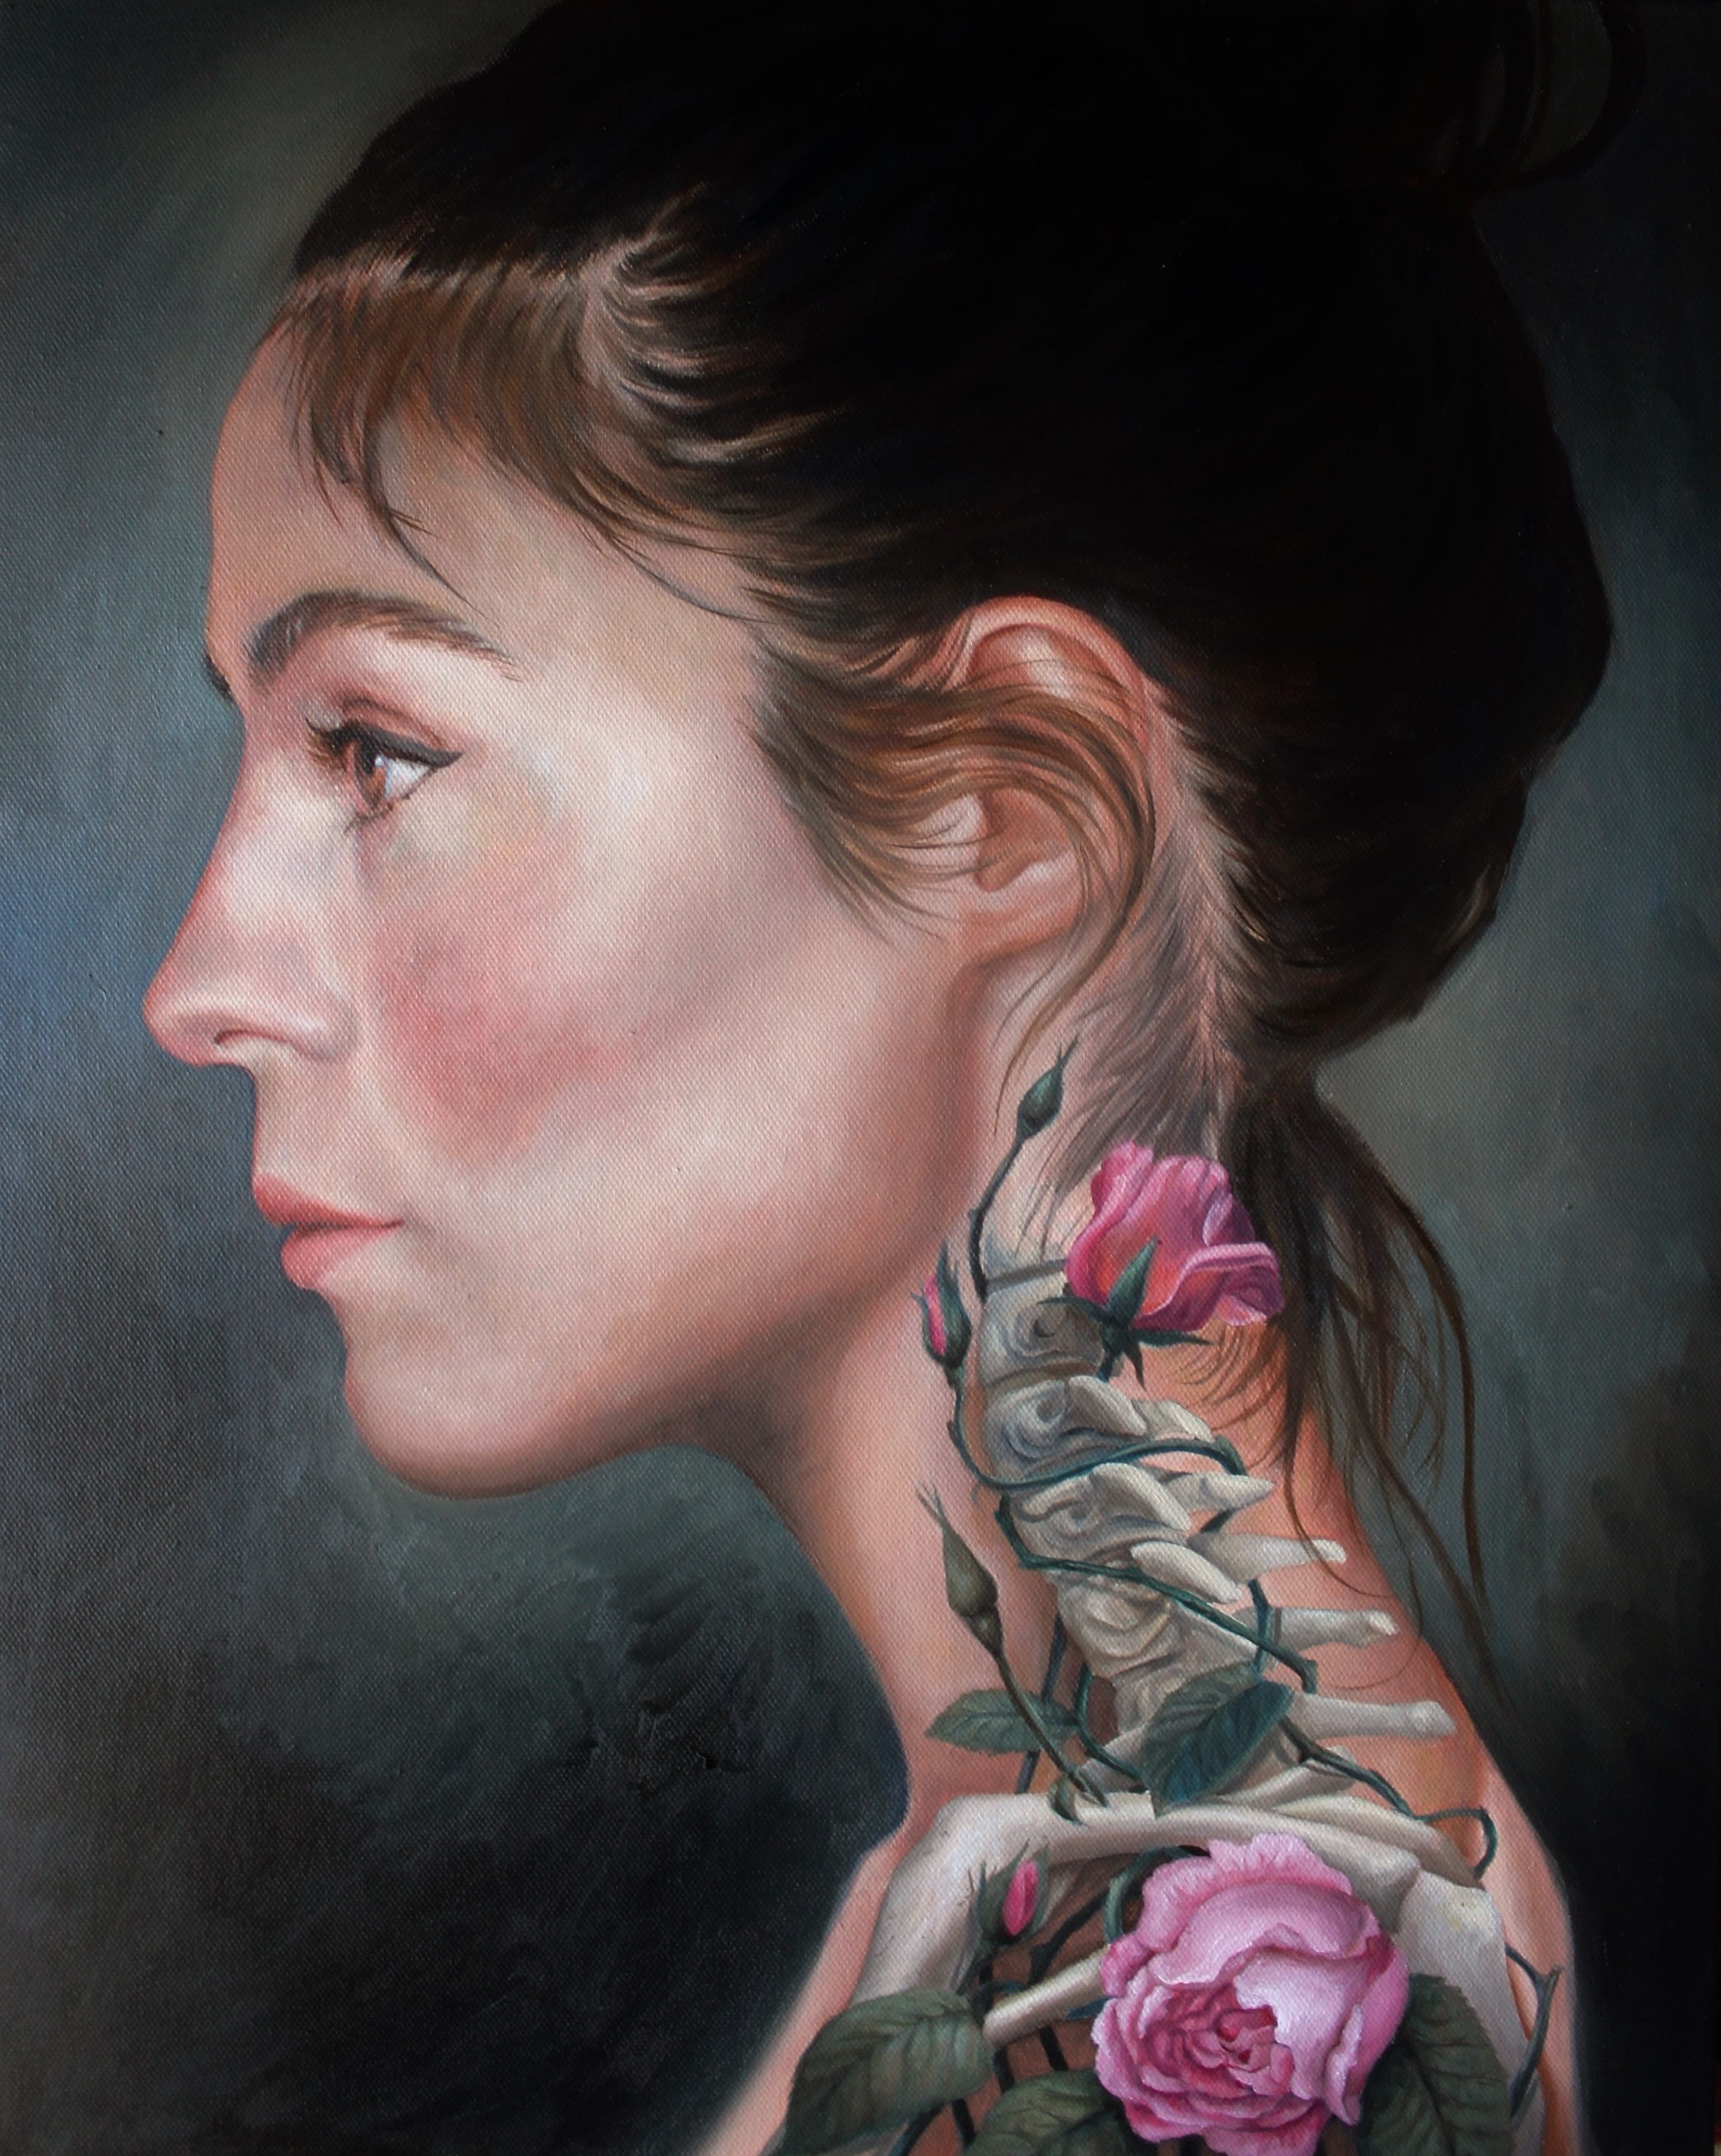 Surgery, 2018, oils on canvas, 60x50cm